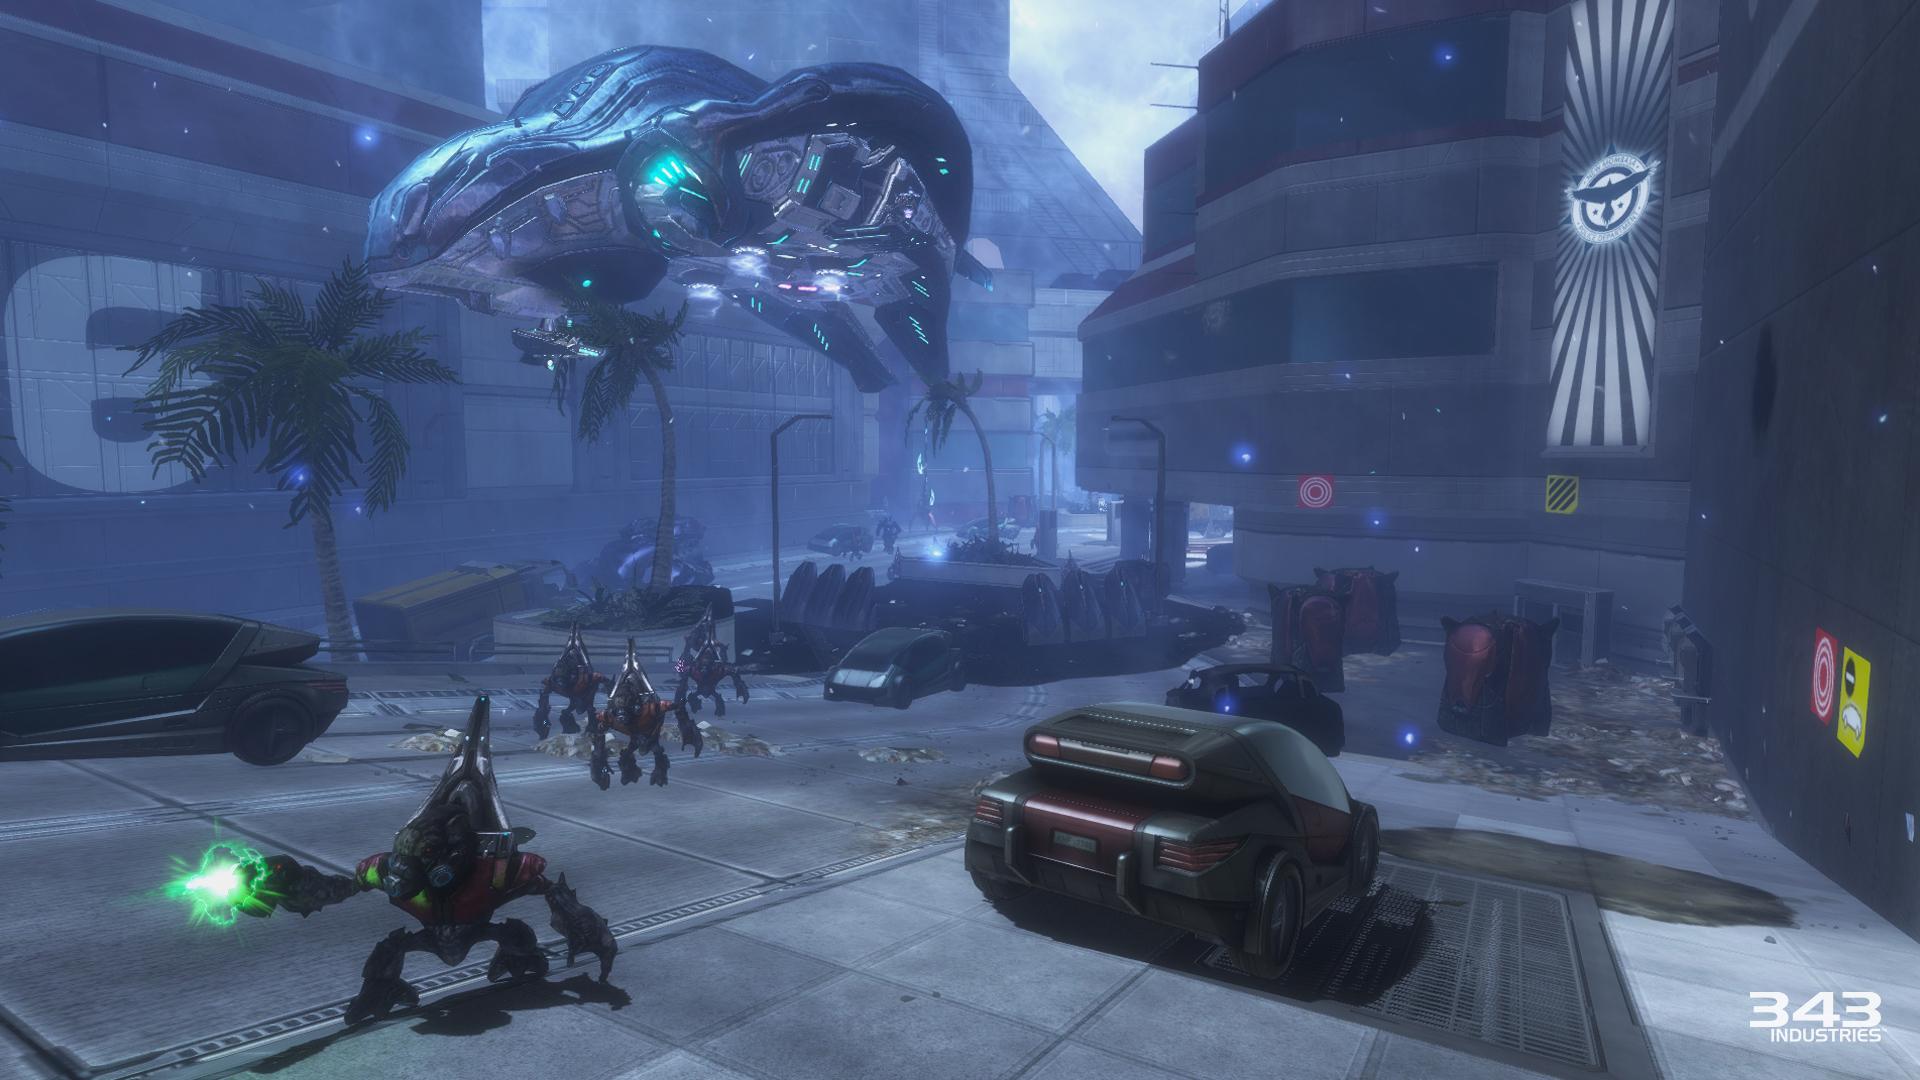 Vyšla kampaň Halo 3: ODST do Halo: The Master Chief Collection 109401